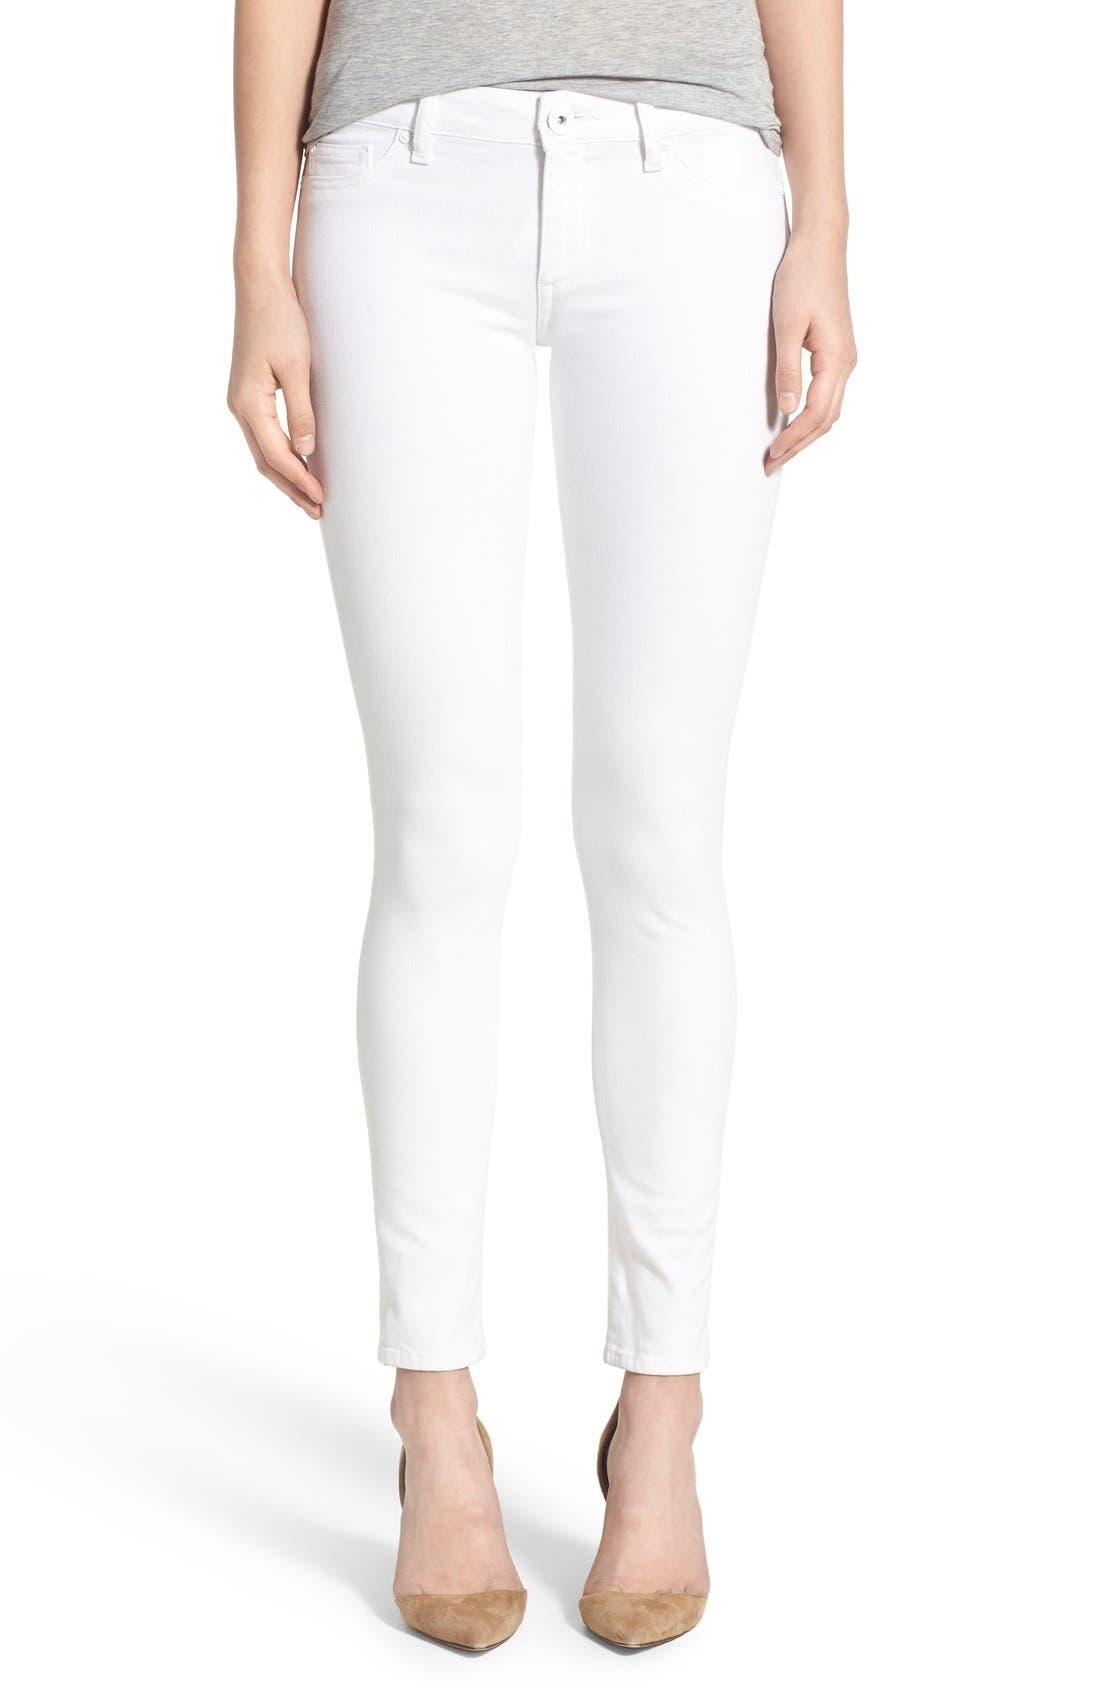 Main Image - DL1961 'Emma' Power Legging Jeans (Porcelain)